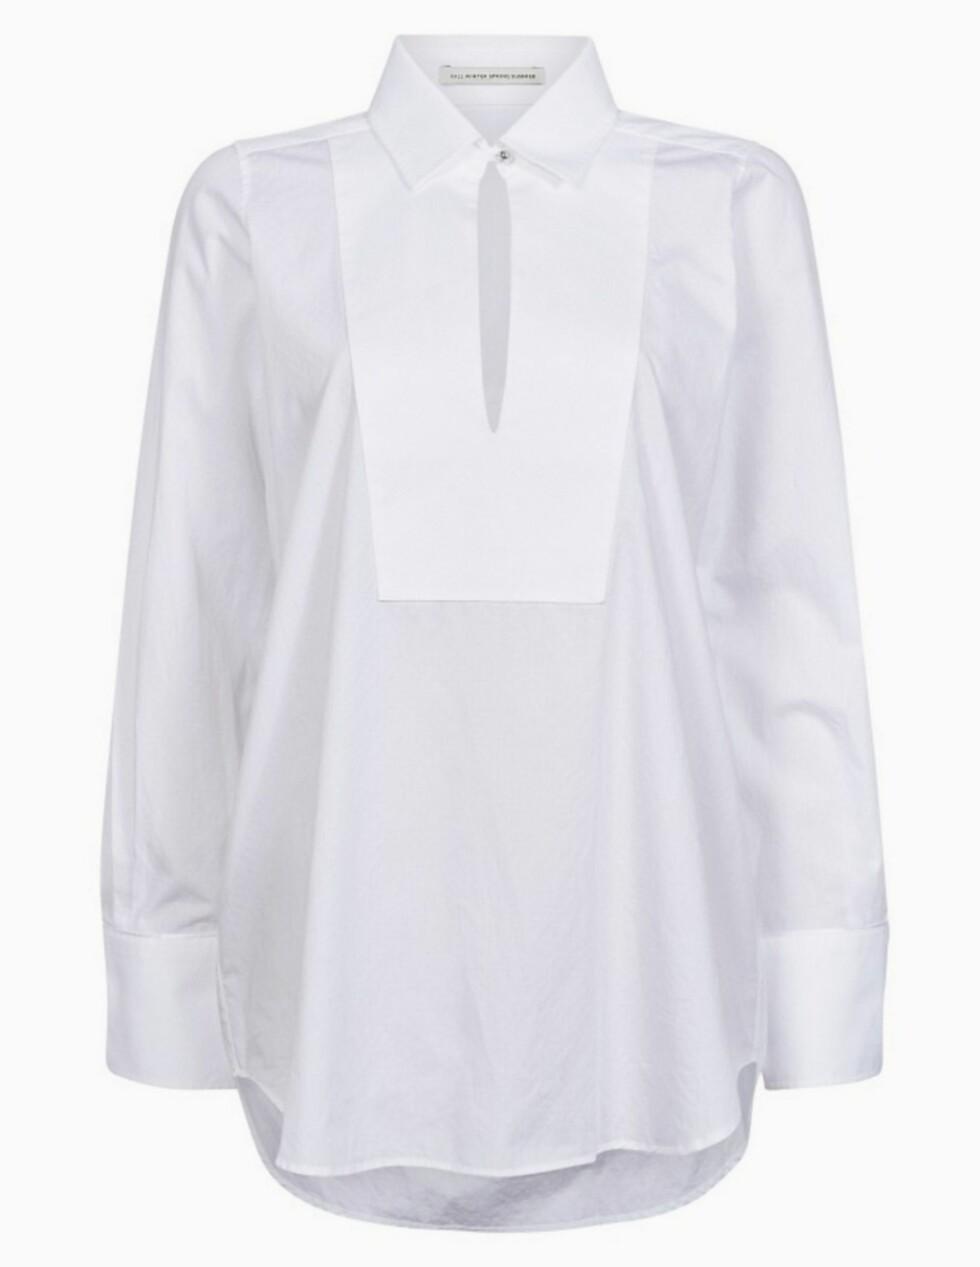 Skjorte fra FWSS | kr 1599 | http://fallwinterspringsummer.com/no/strange-pursuits-shirt.html